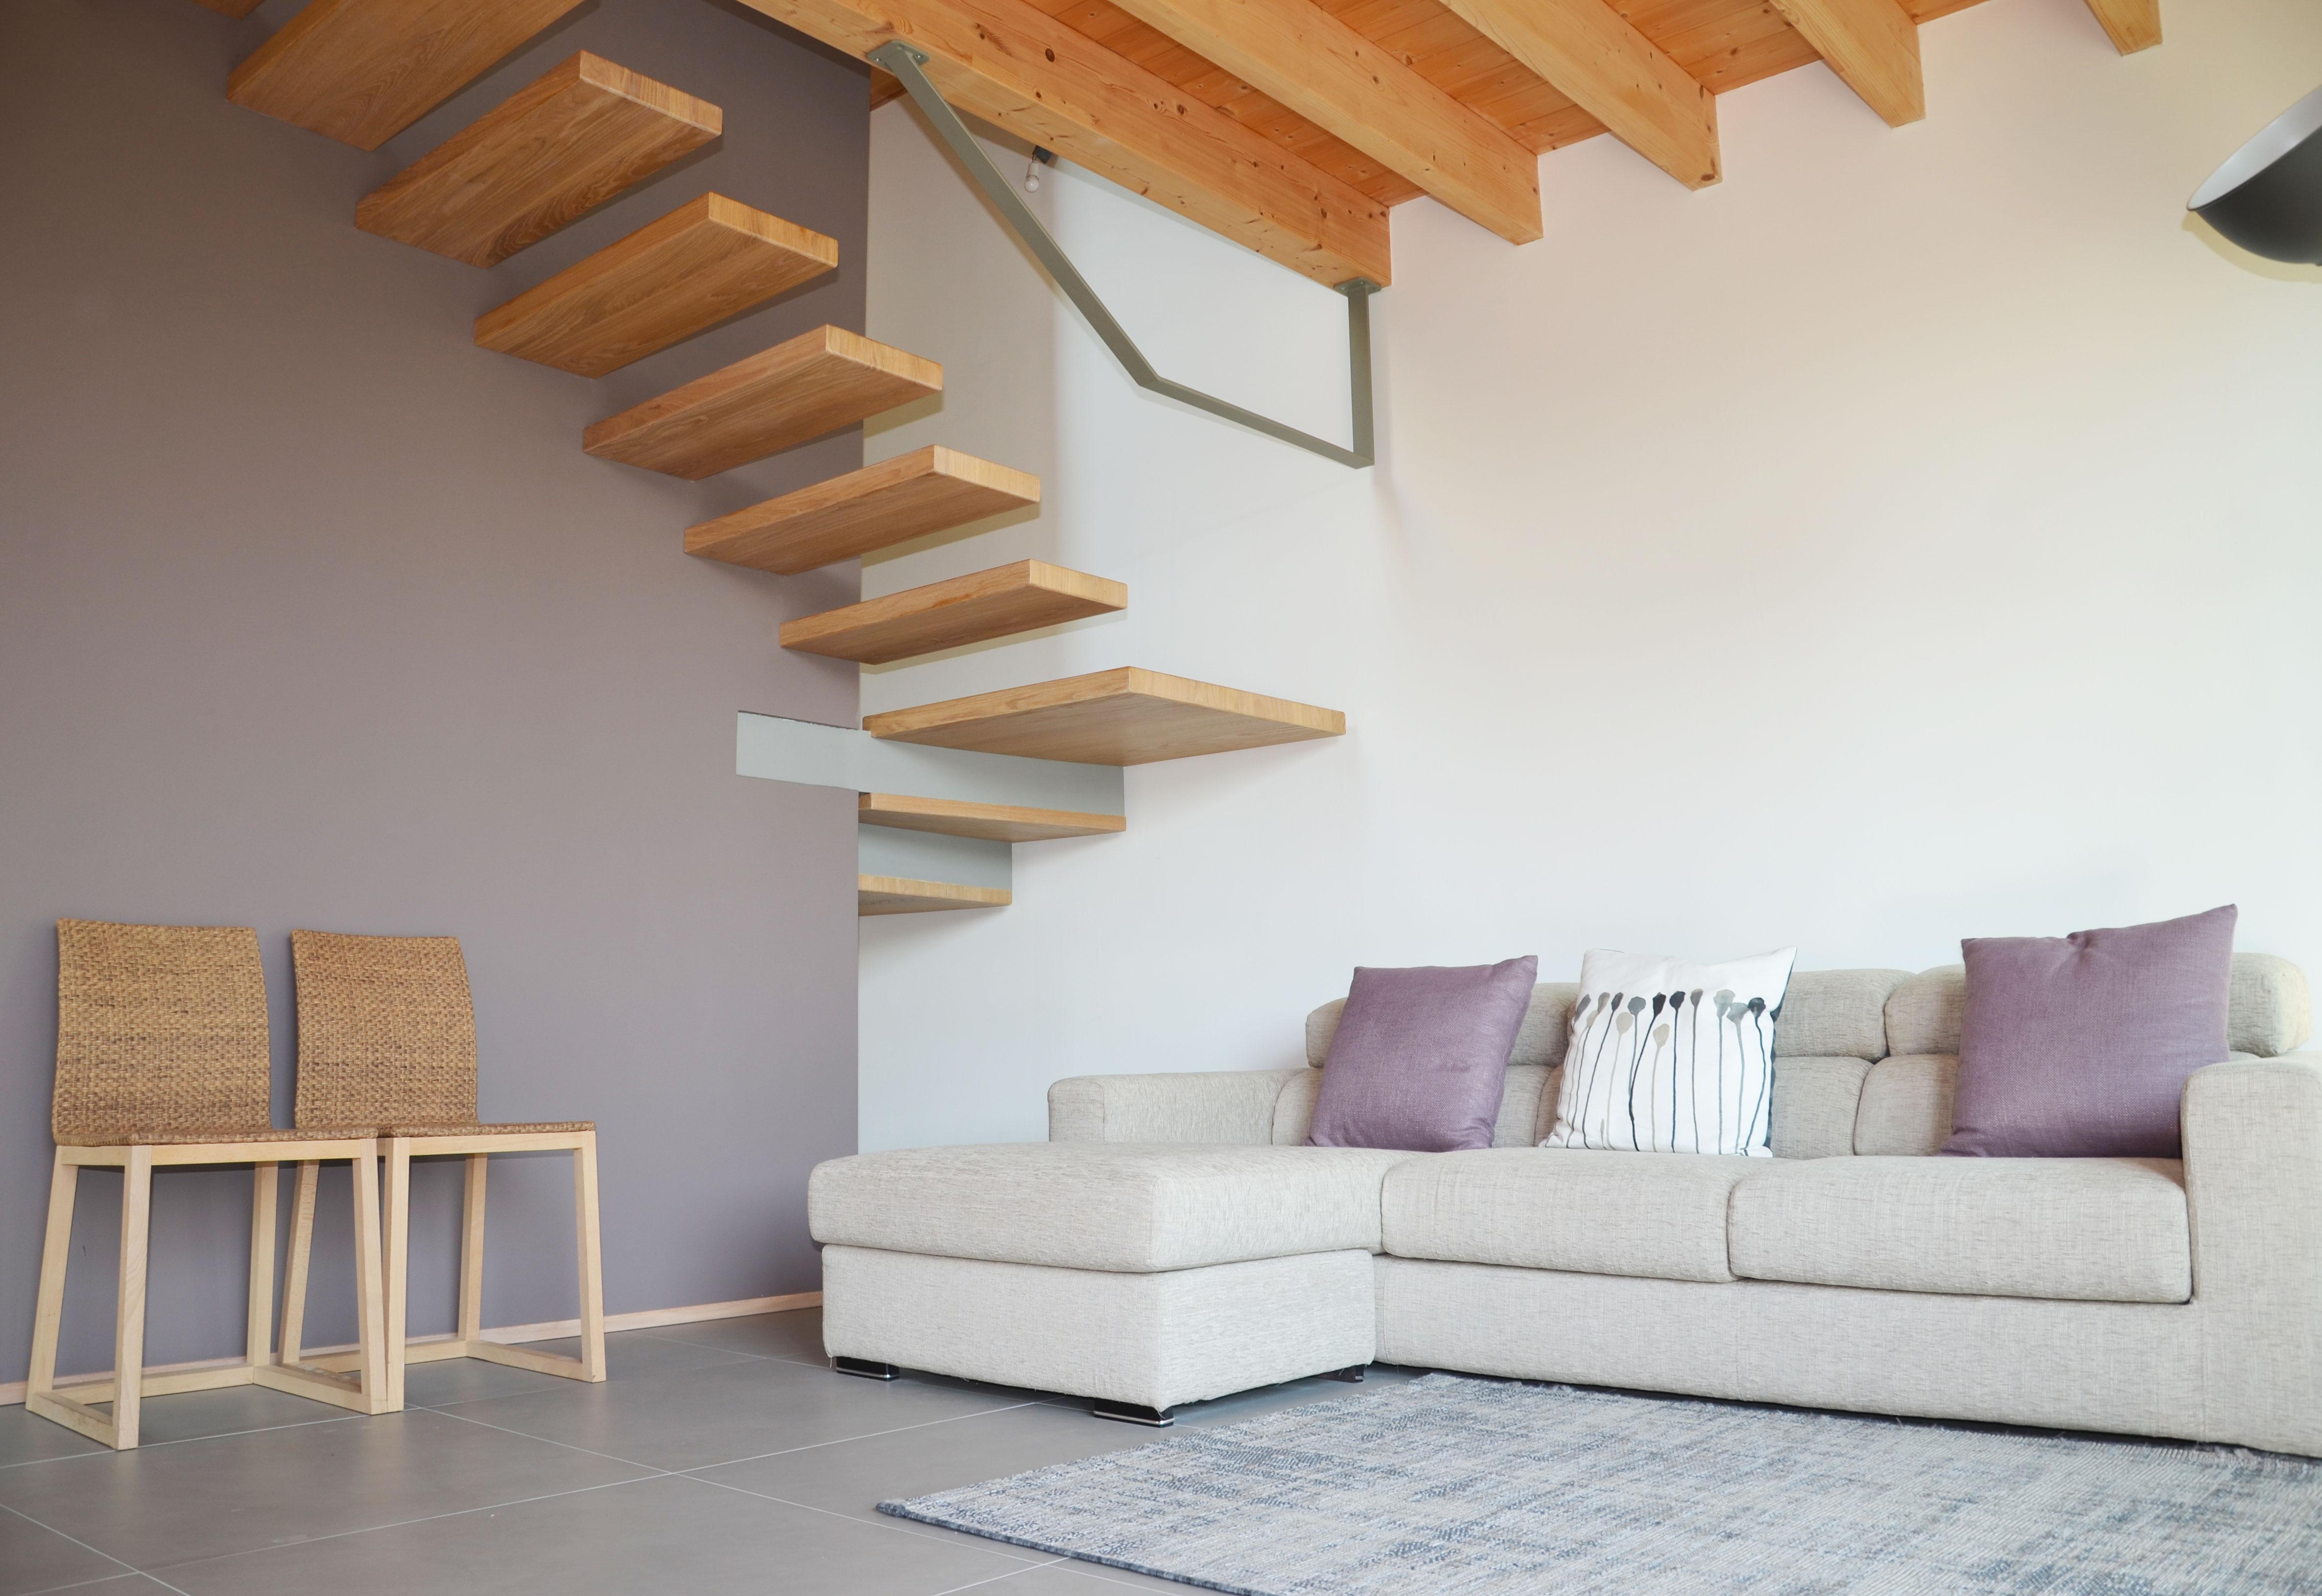 Abitazioni a risparmio energetico a treviso bma studio - Risparmio energetico casa ...